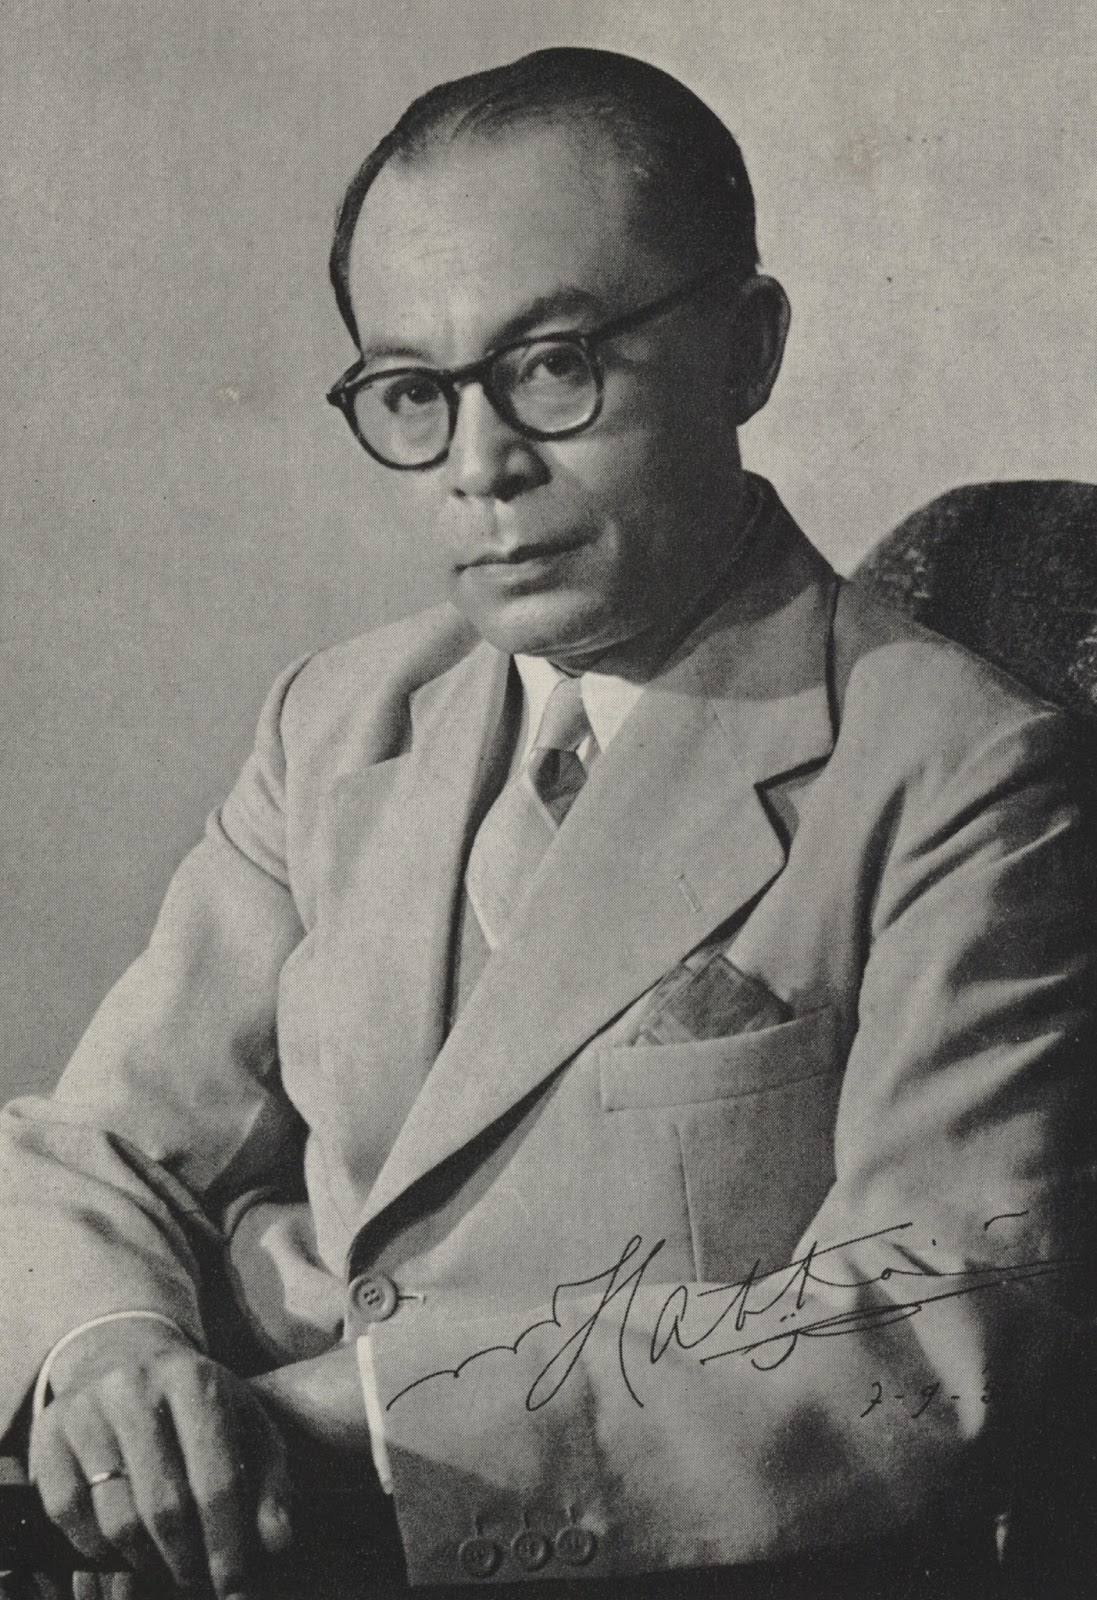 Biografi Mohammad Hatta Secara Singkat